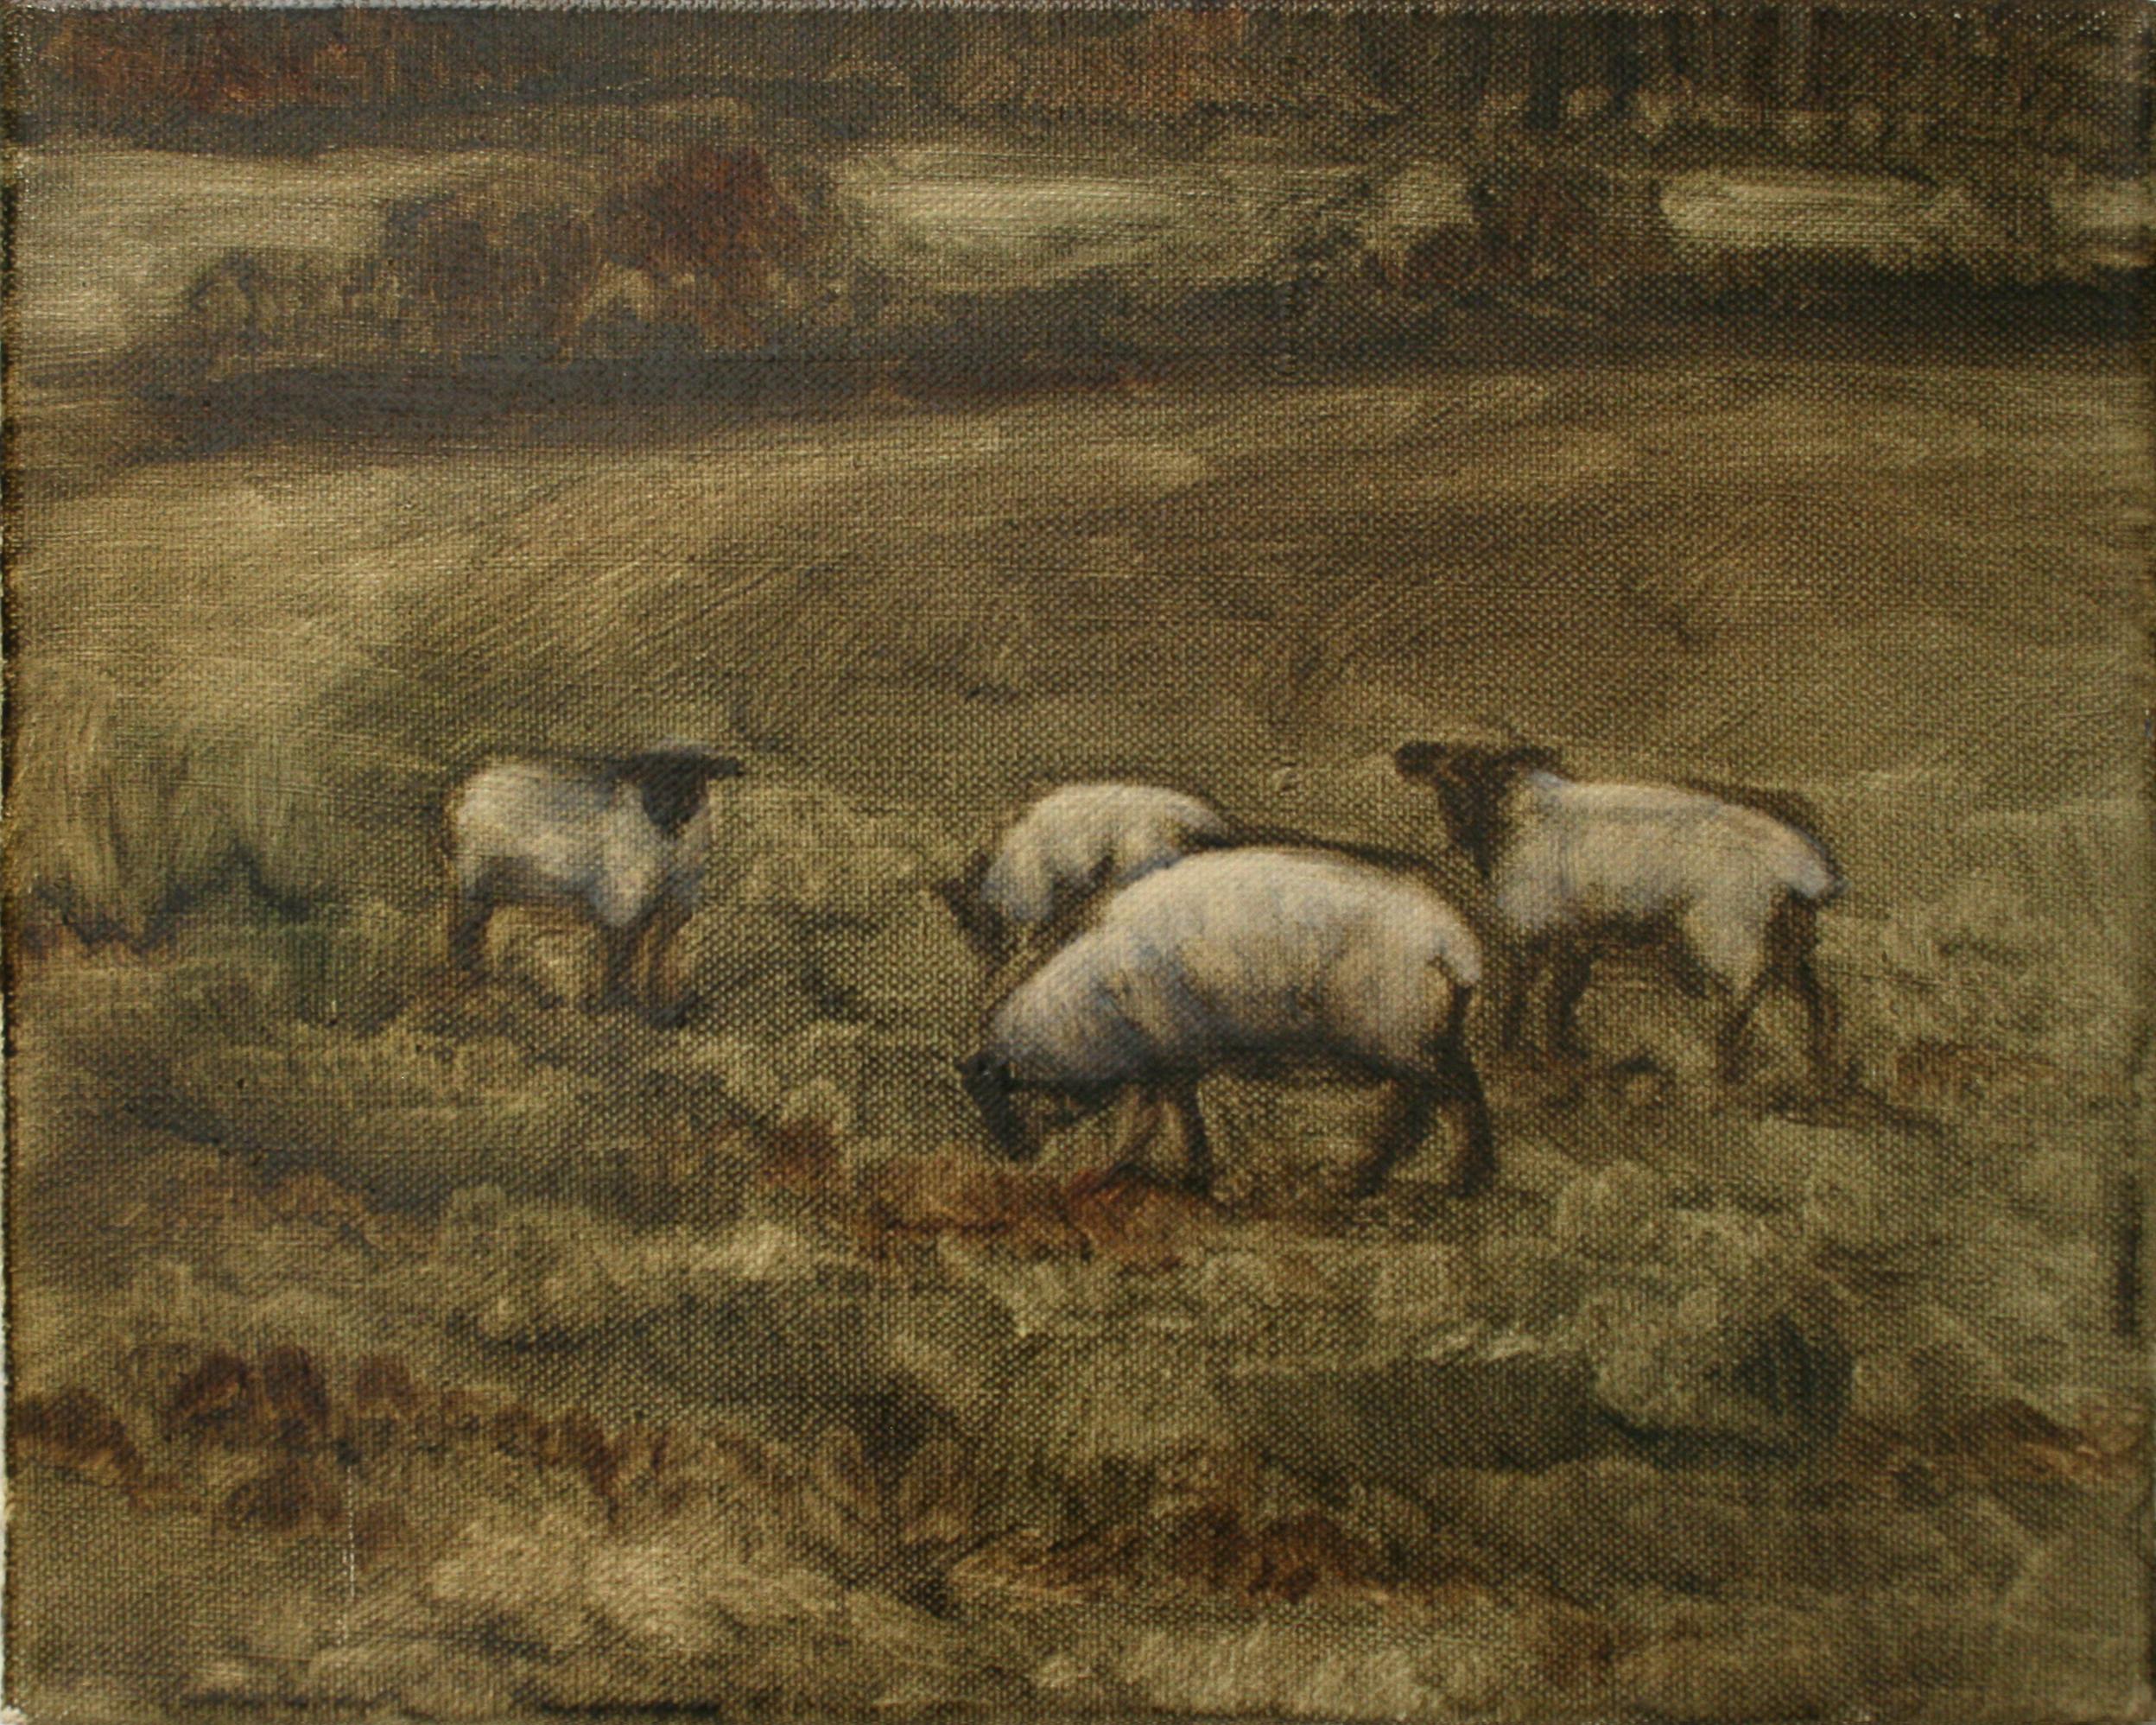 "Sheep Study 6, oil on canvas 30 x 24.5 cm (12"" x 9.5""), 2016"